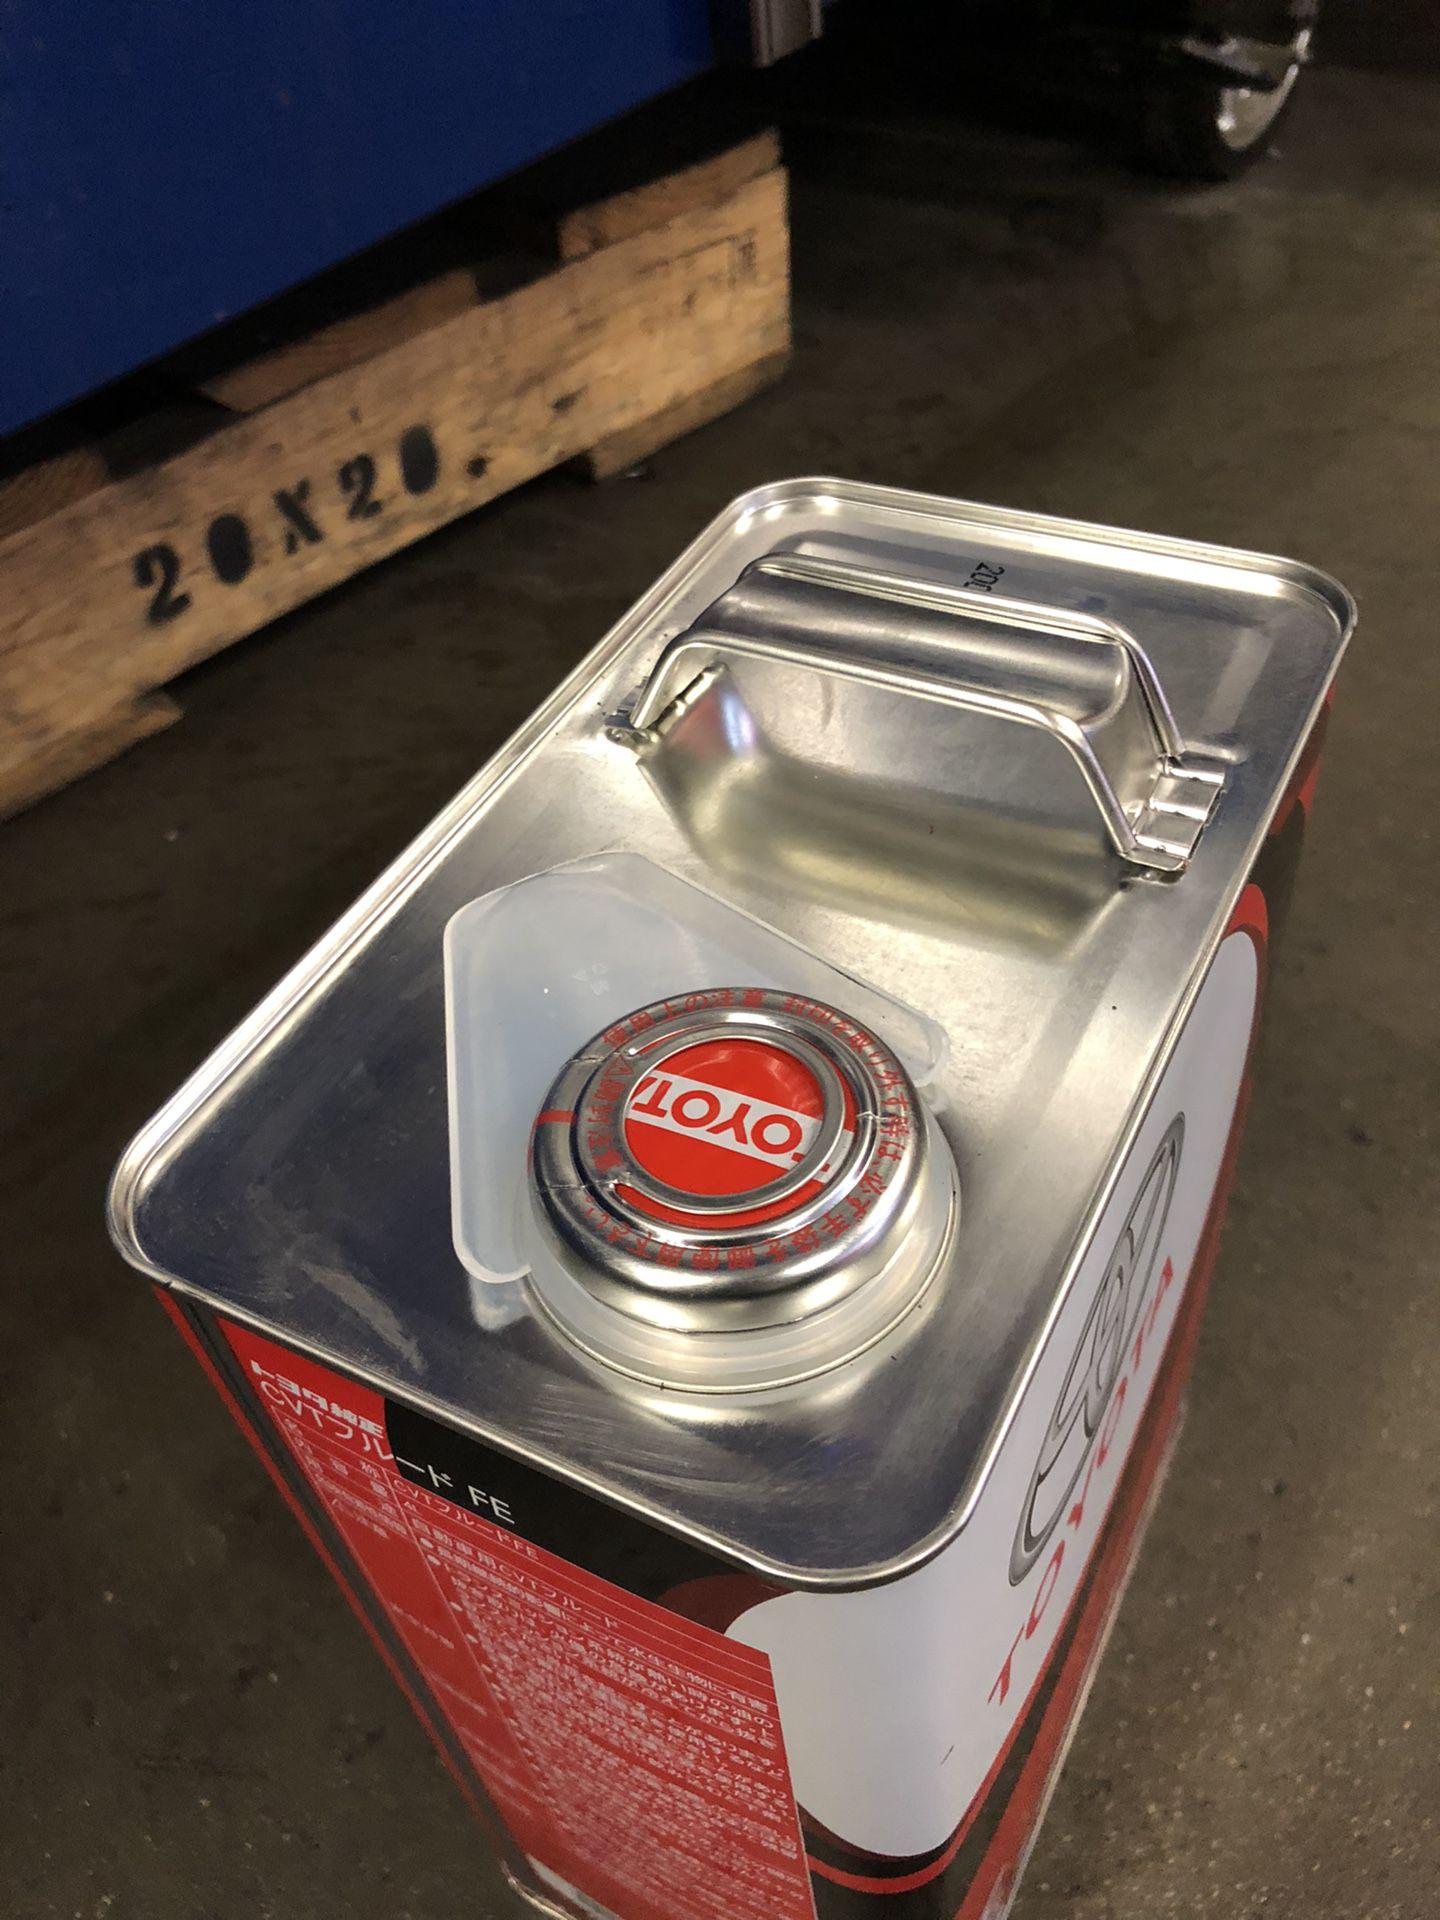 Toyota Lexus CVT fluid